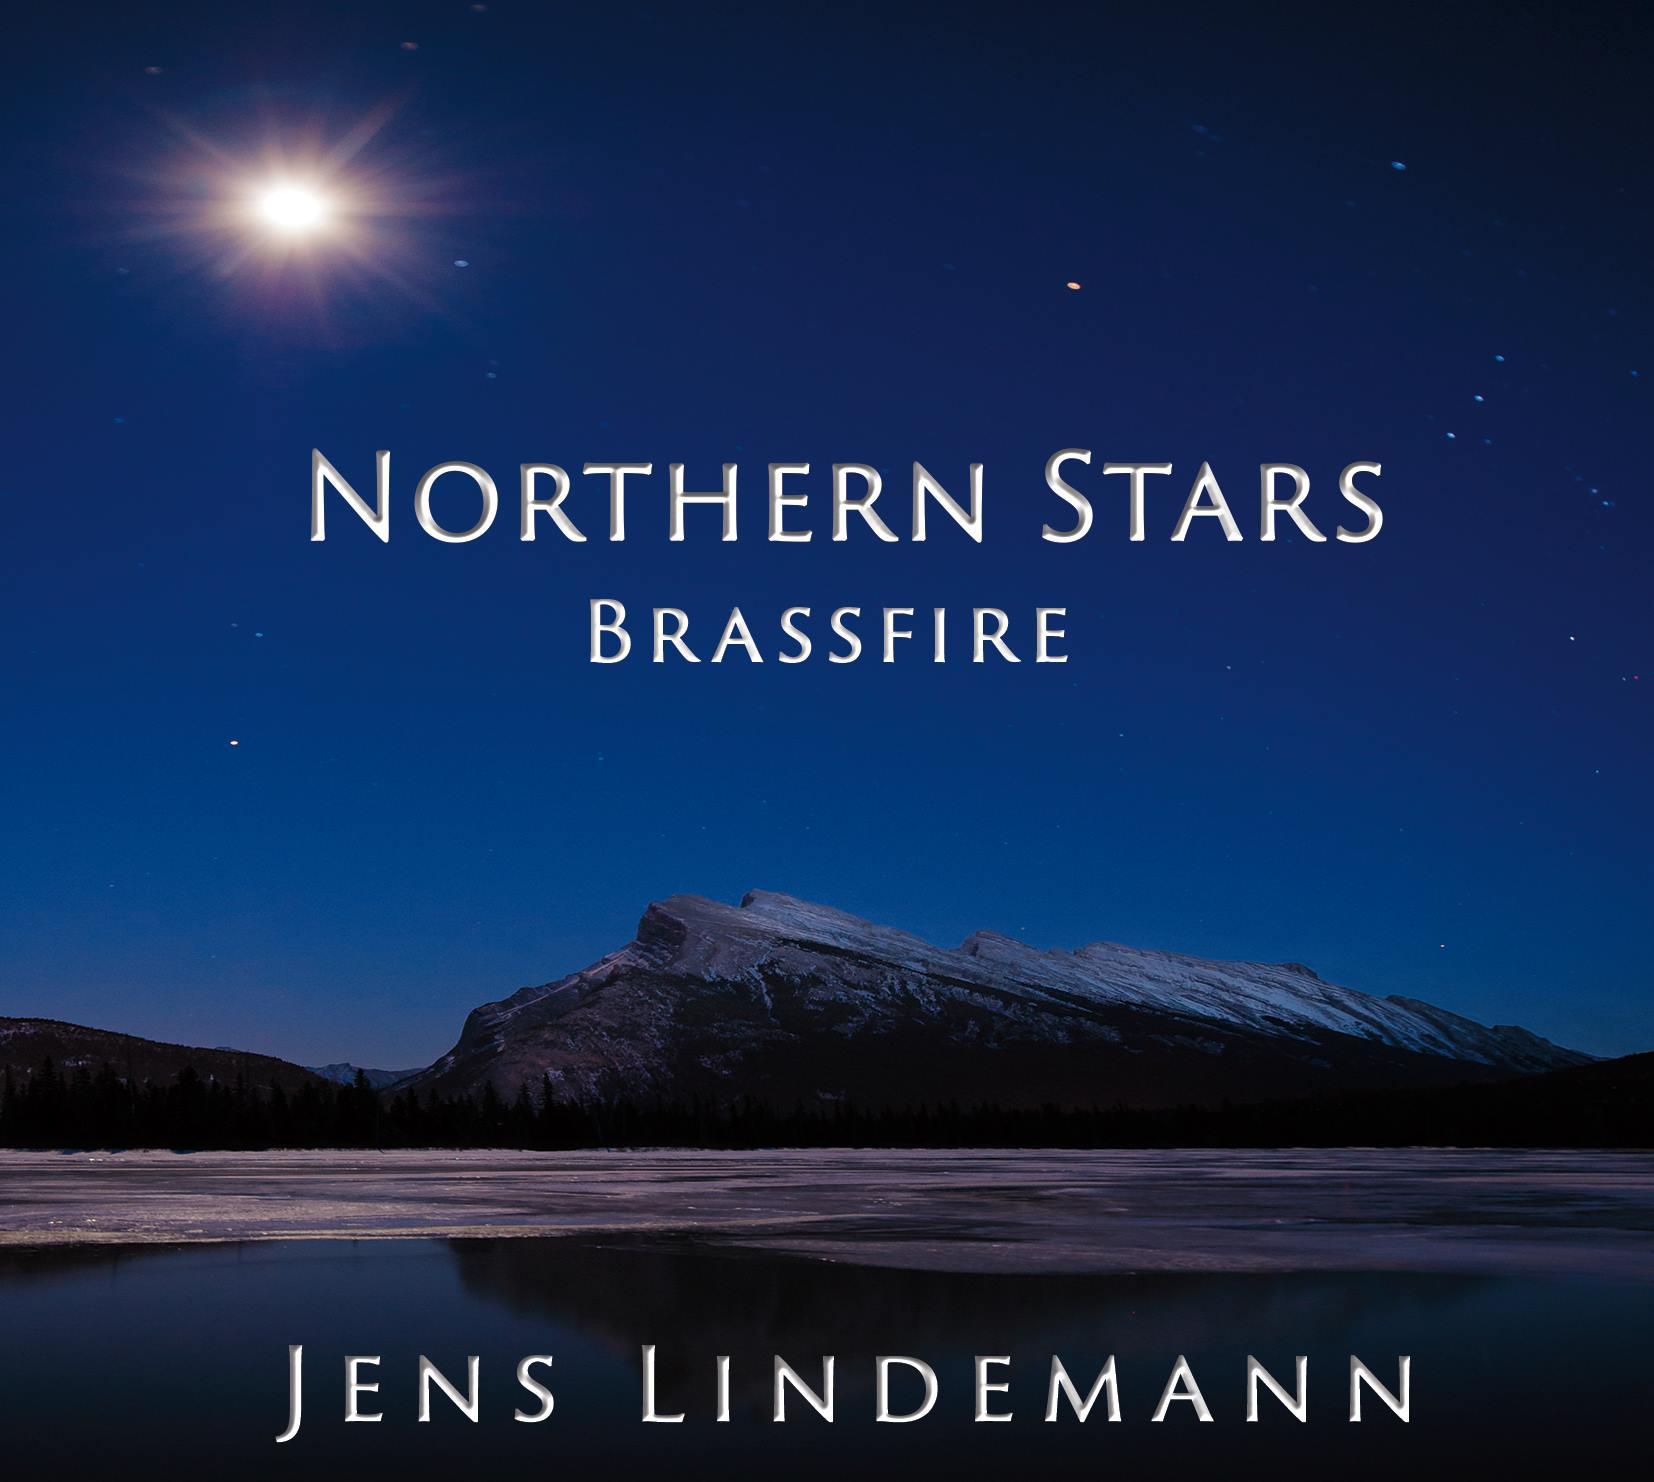 Lindemann-Northern Lights 2018.jpg